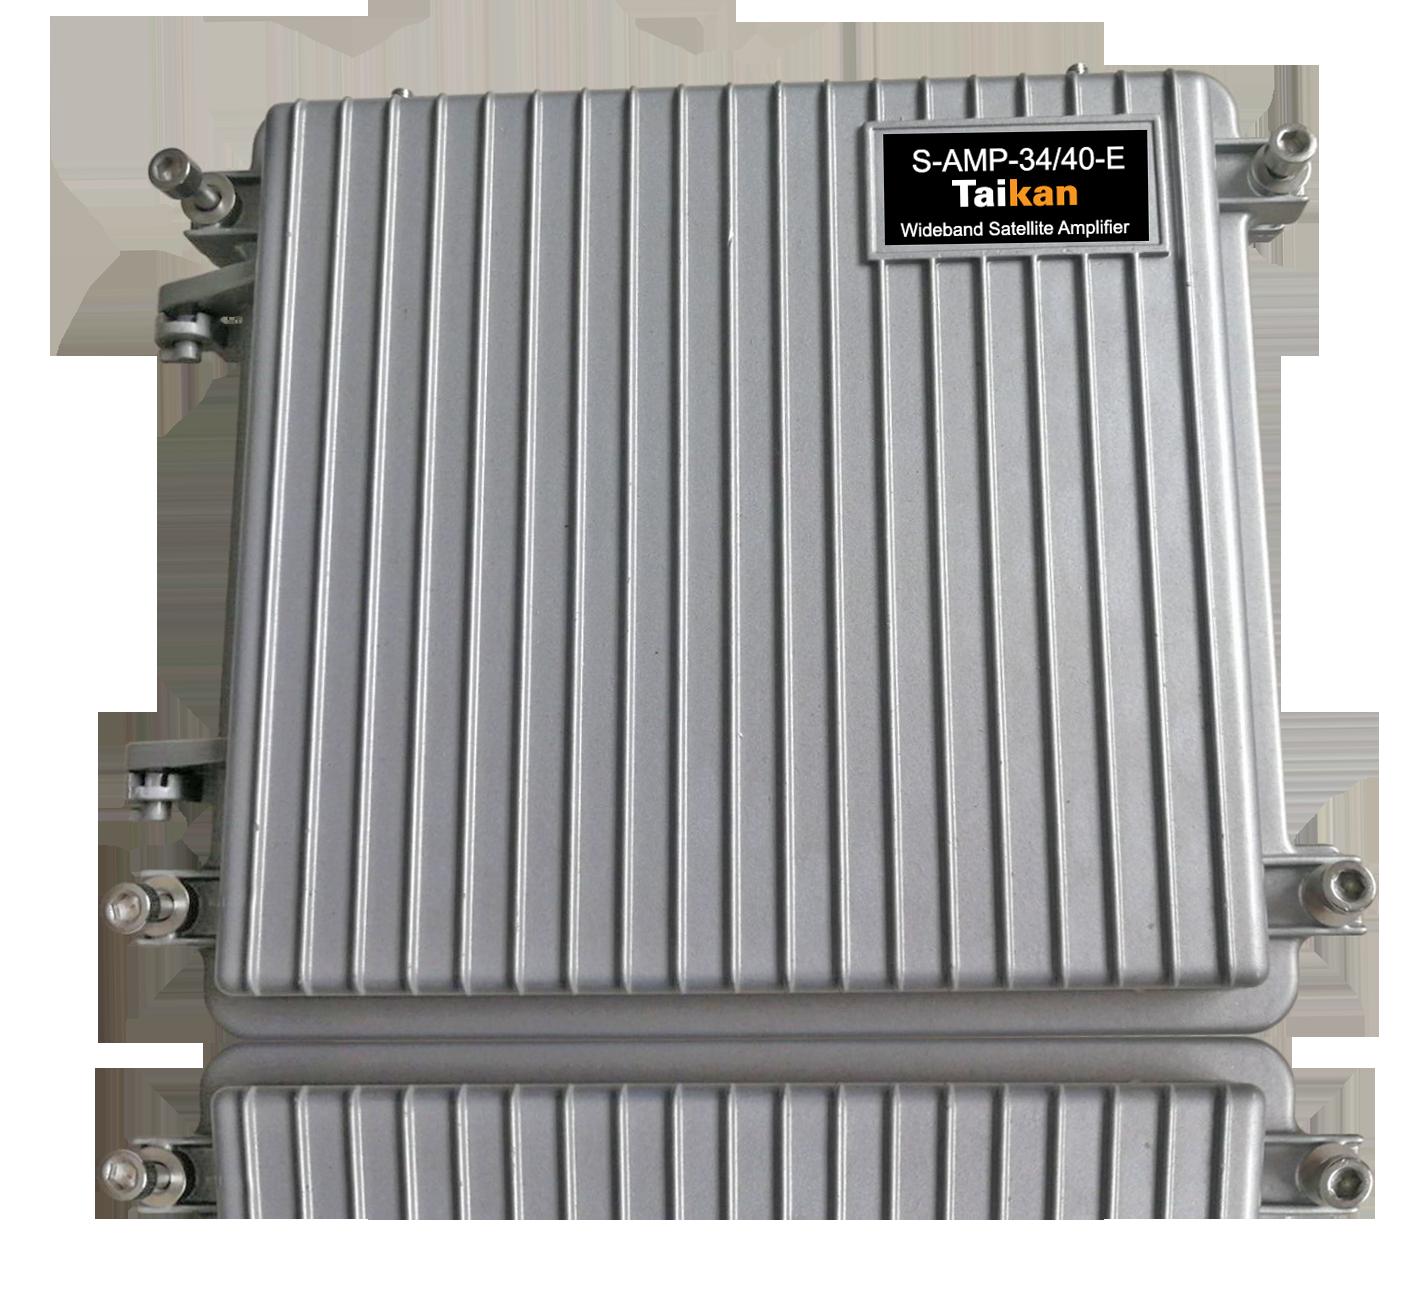 Satellite Amplifier 1 terrestrial and satellite signals taikan scte for network infrastructure